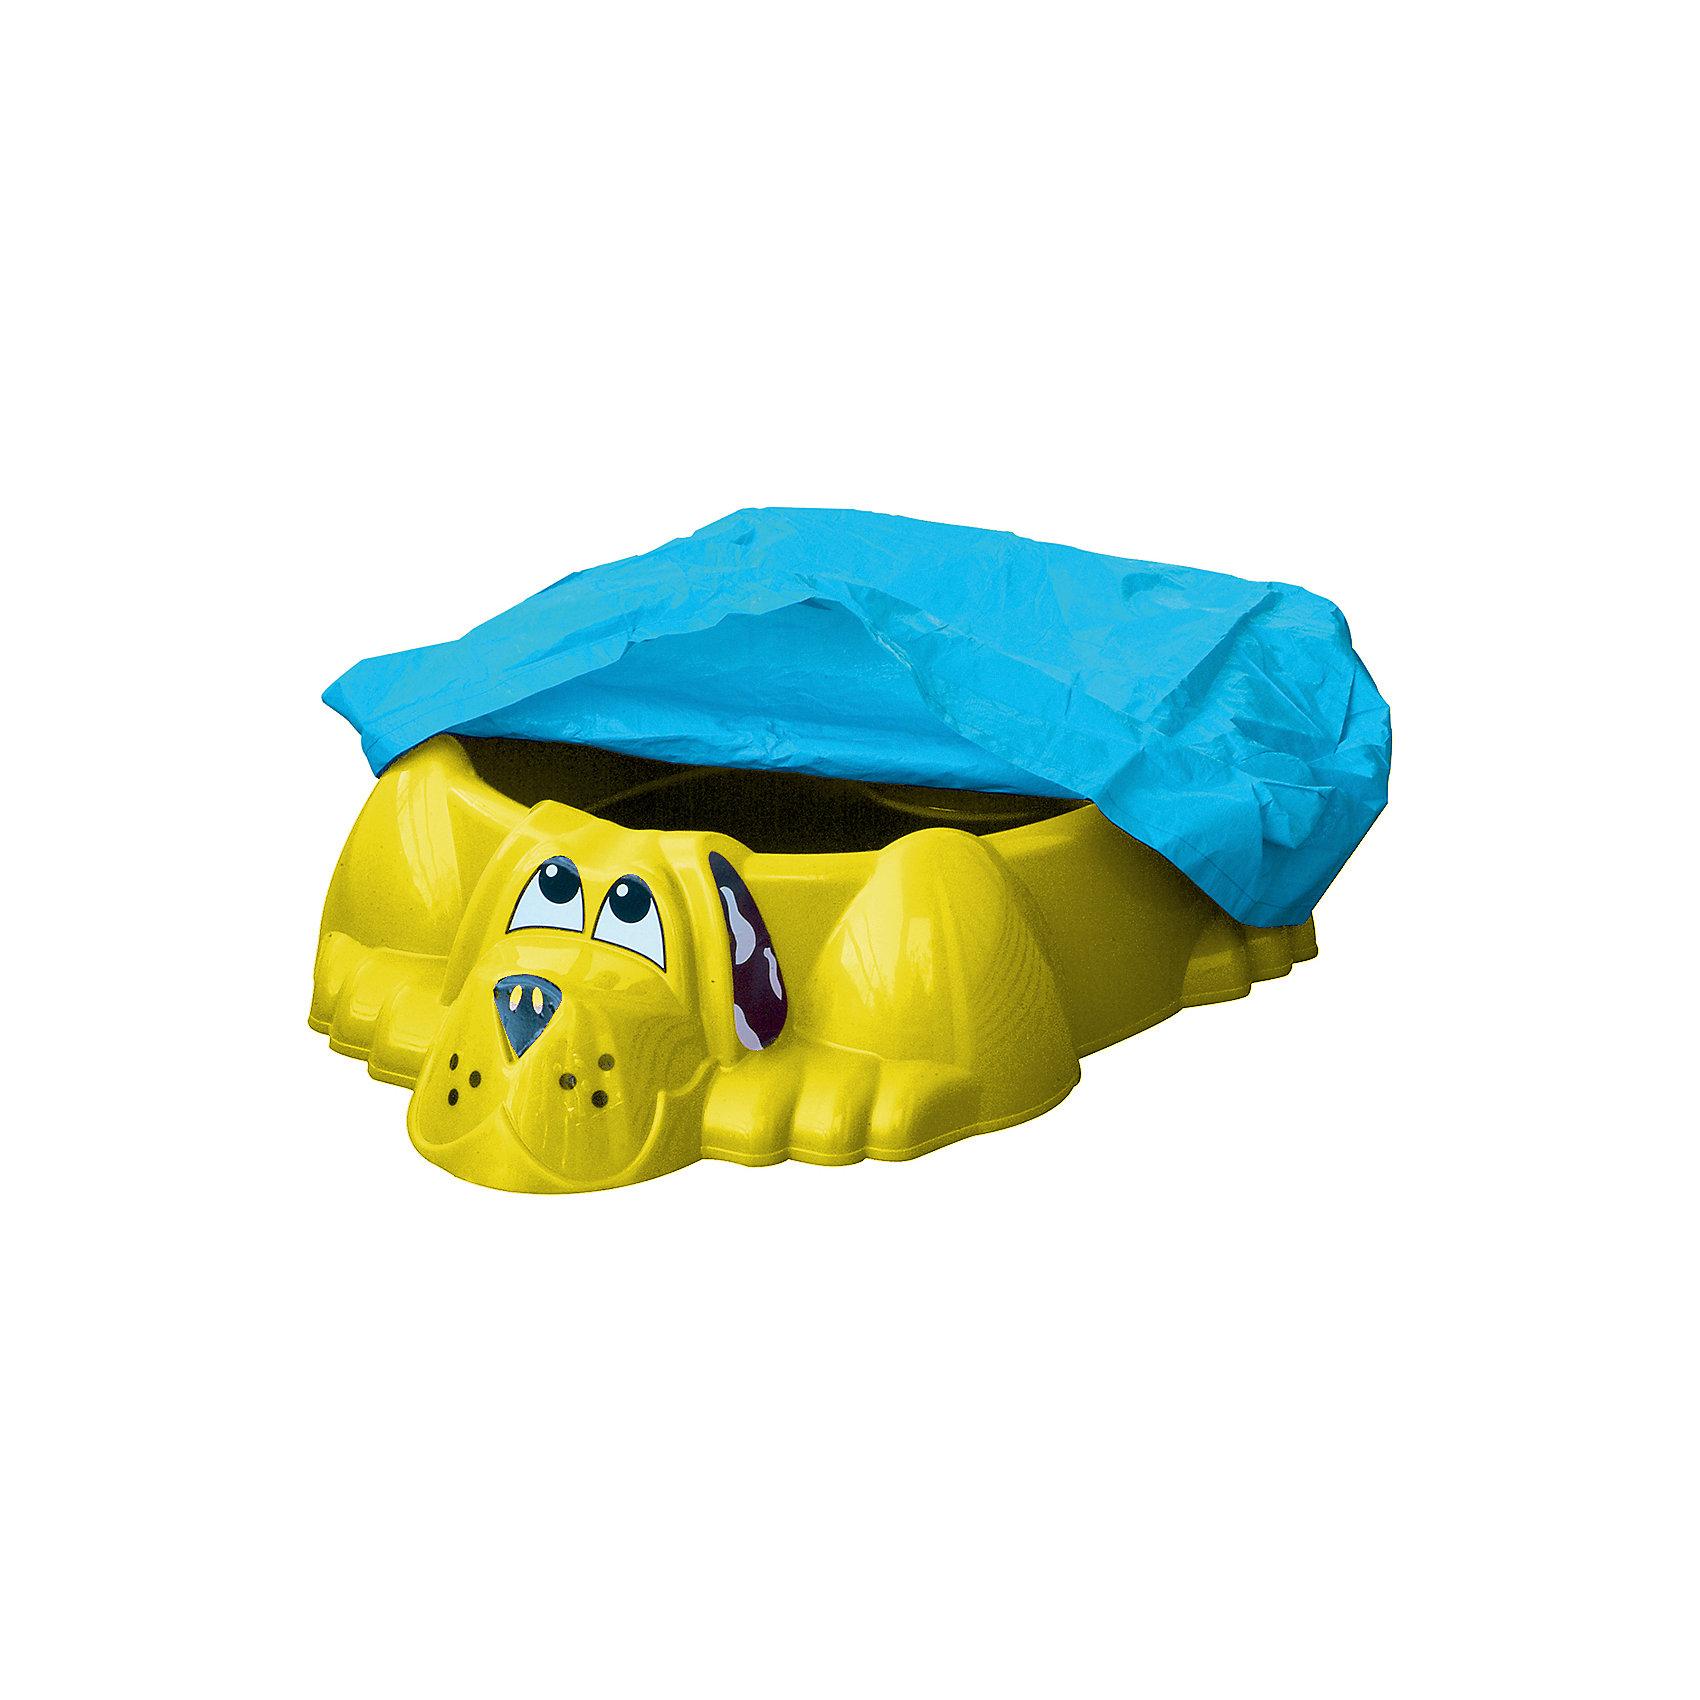 Marianplast Бассейн-песочница Собачка с покрытием, синий, Marian Plast marian plast бассейн песочница собачка с крышкой